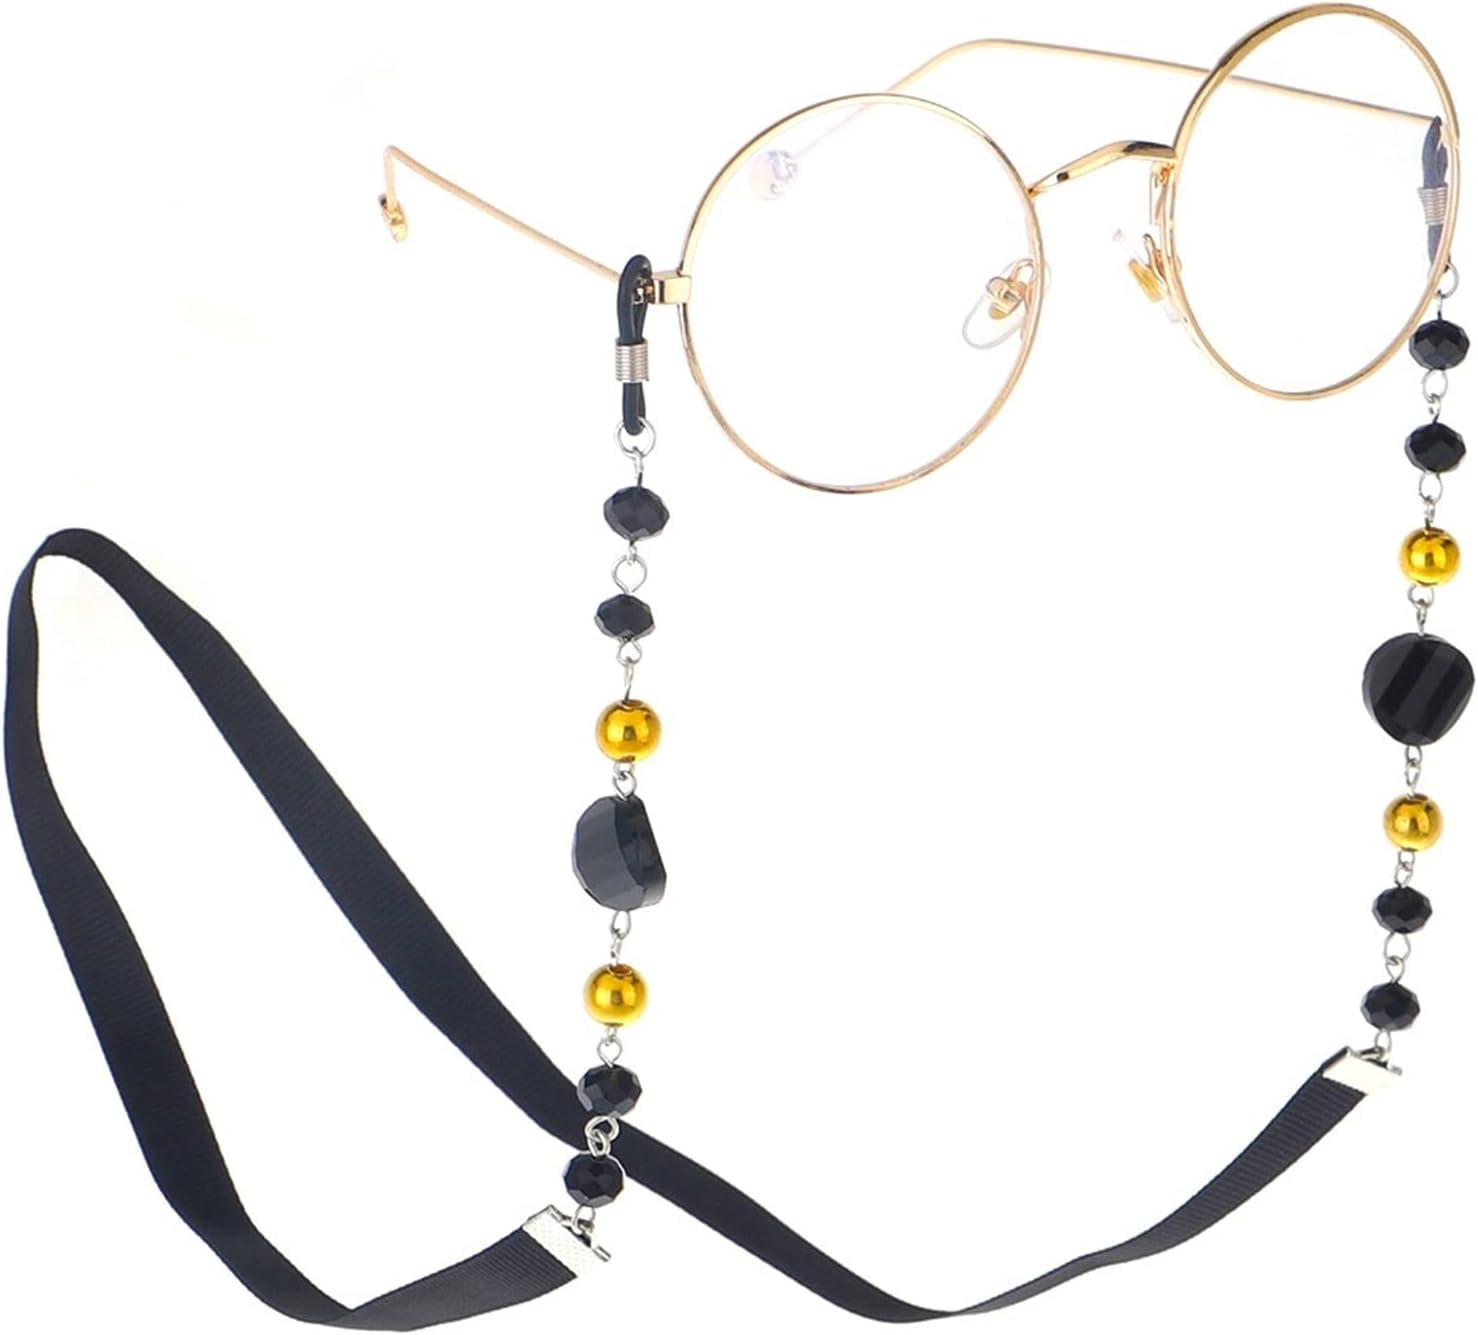 HYMD Eyeglass Chain Fashion Women Sunglass Chain Black Acrylic Beads Eyeglass Chains Anti-Slip Eyewear Cord Holder Neck Strap Reading Glasses Rope